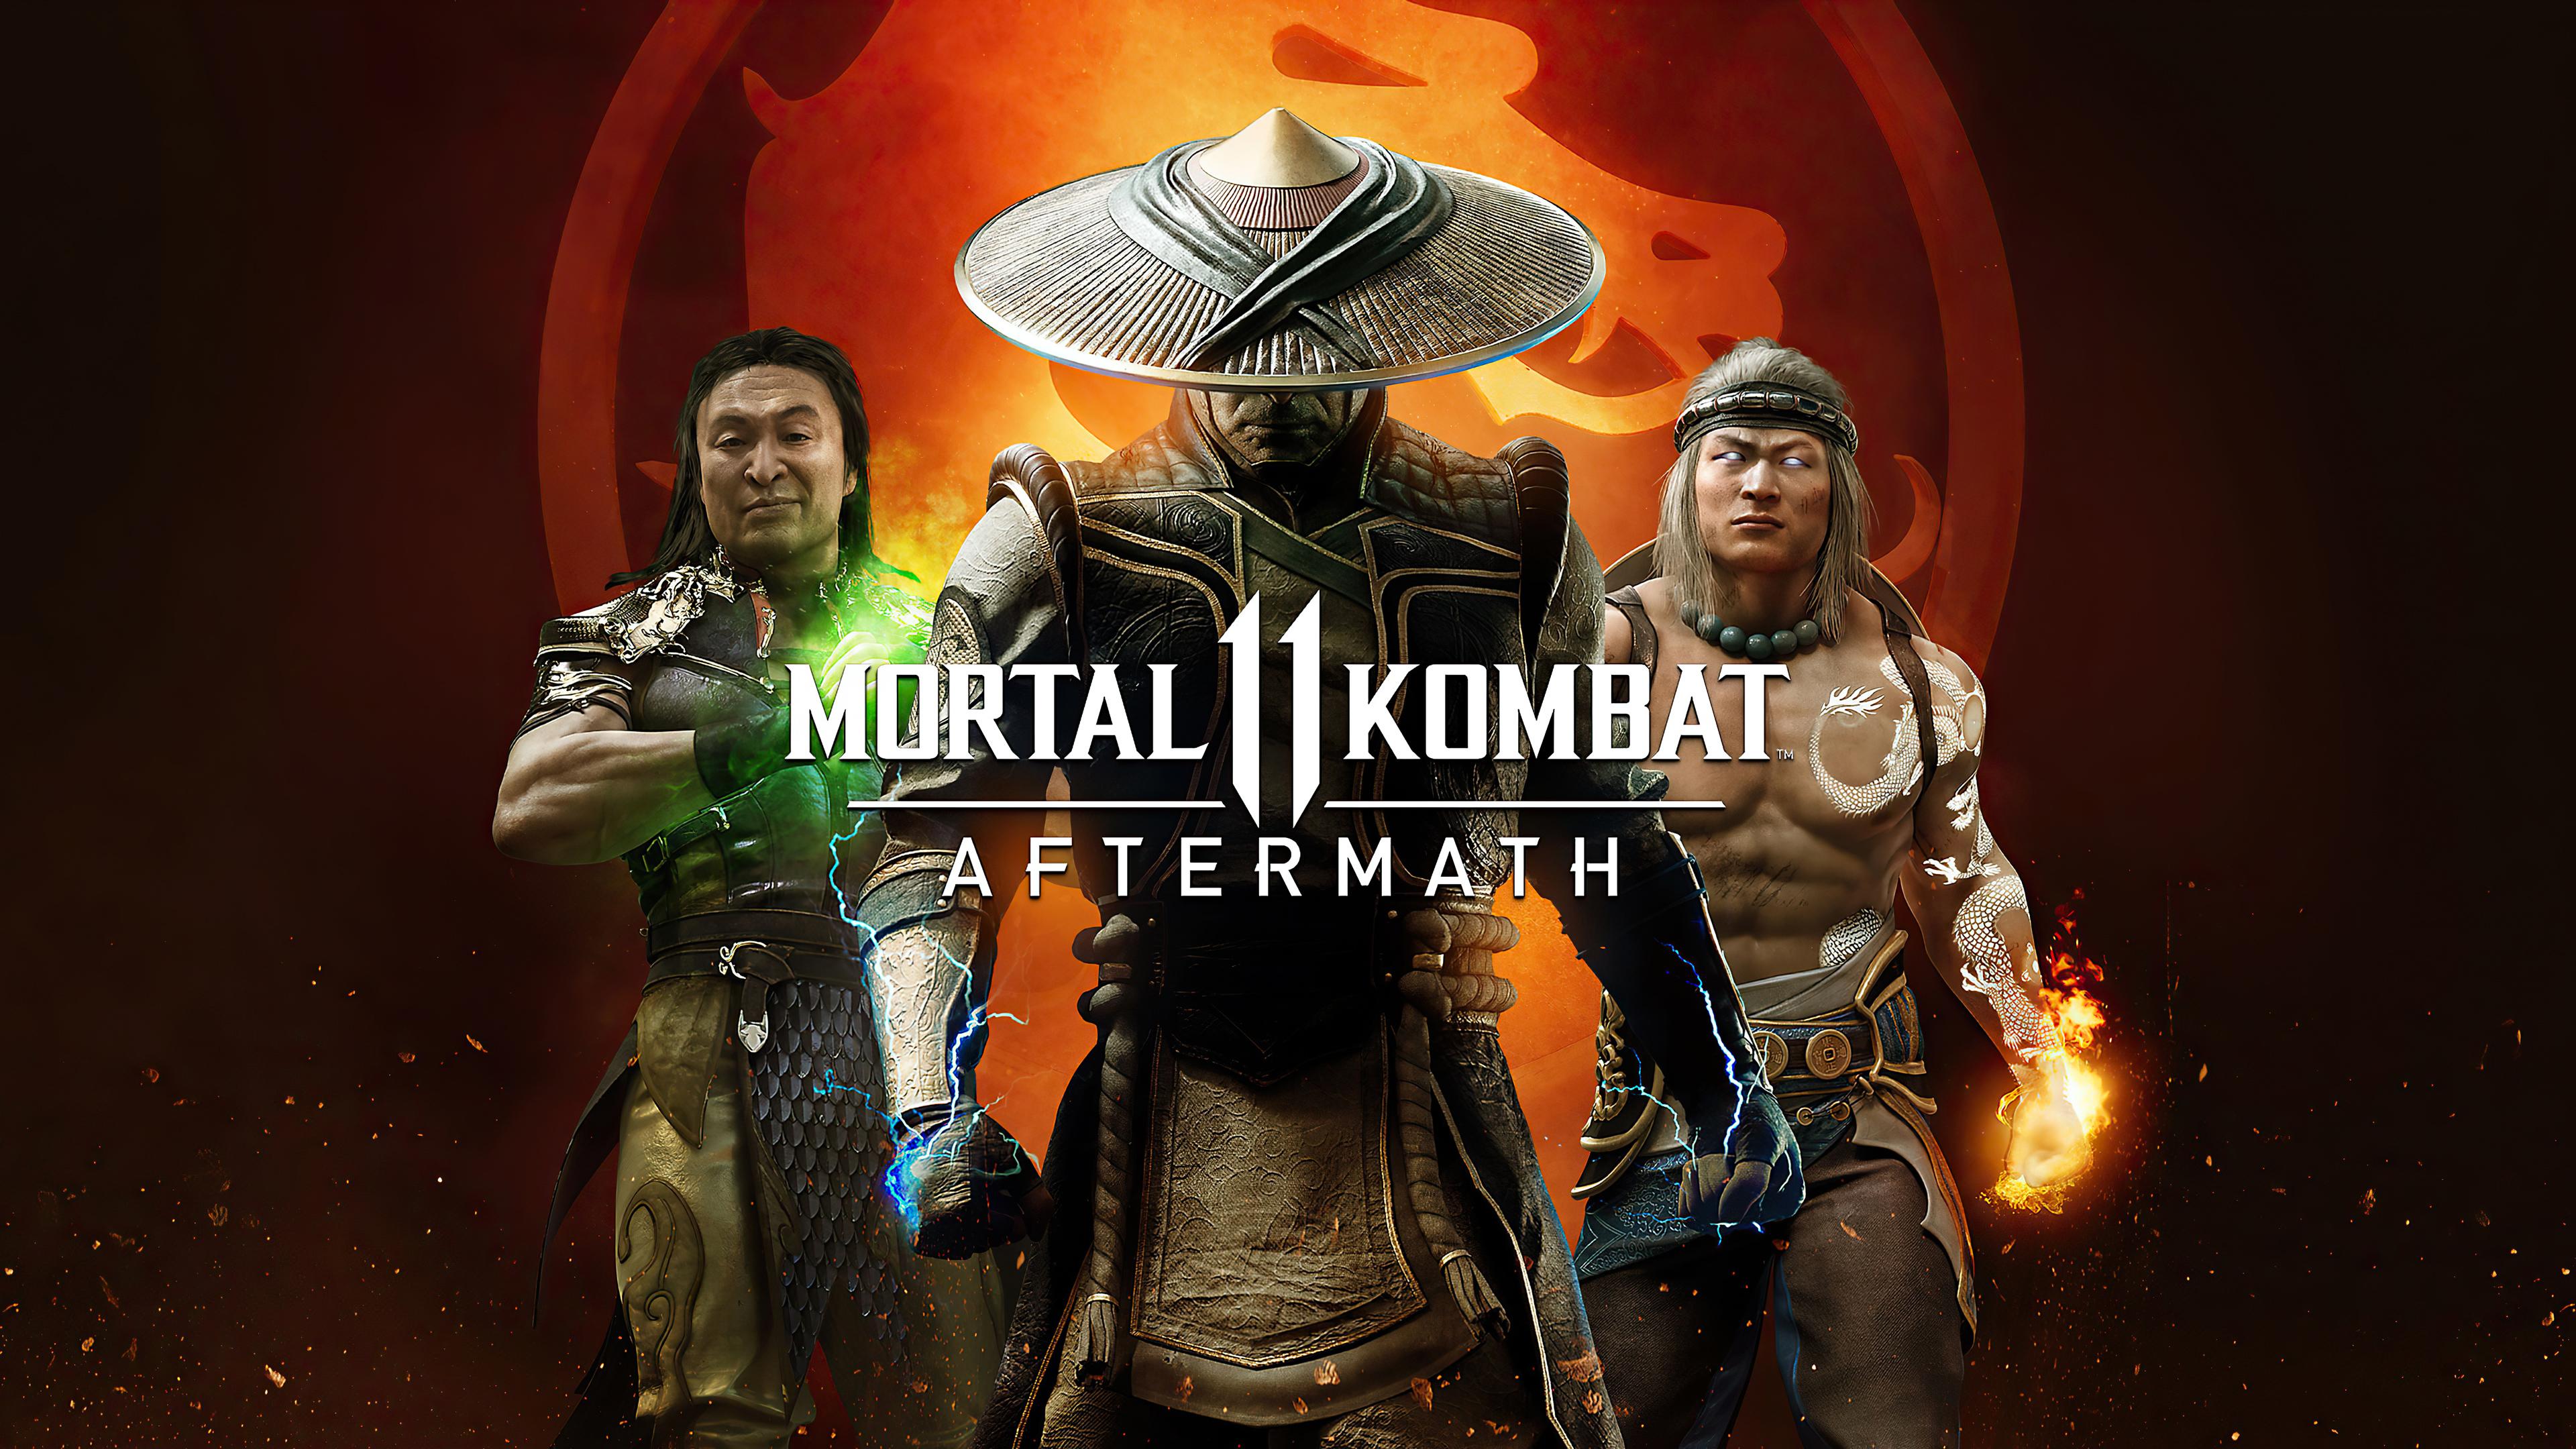 Mortal Kombat 11 Aftermath Game, HD Games, 4k Wallpapers ...